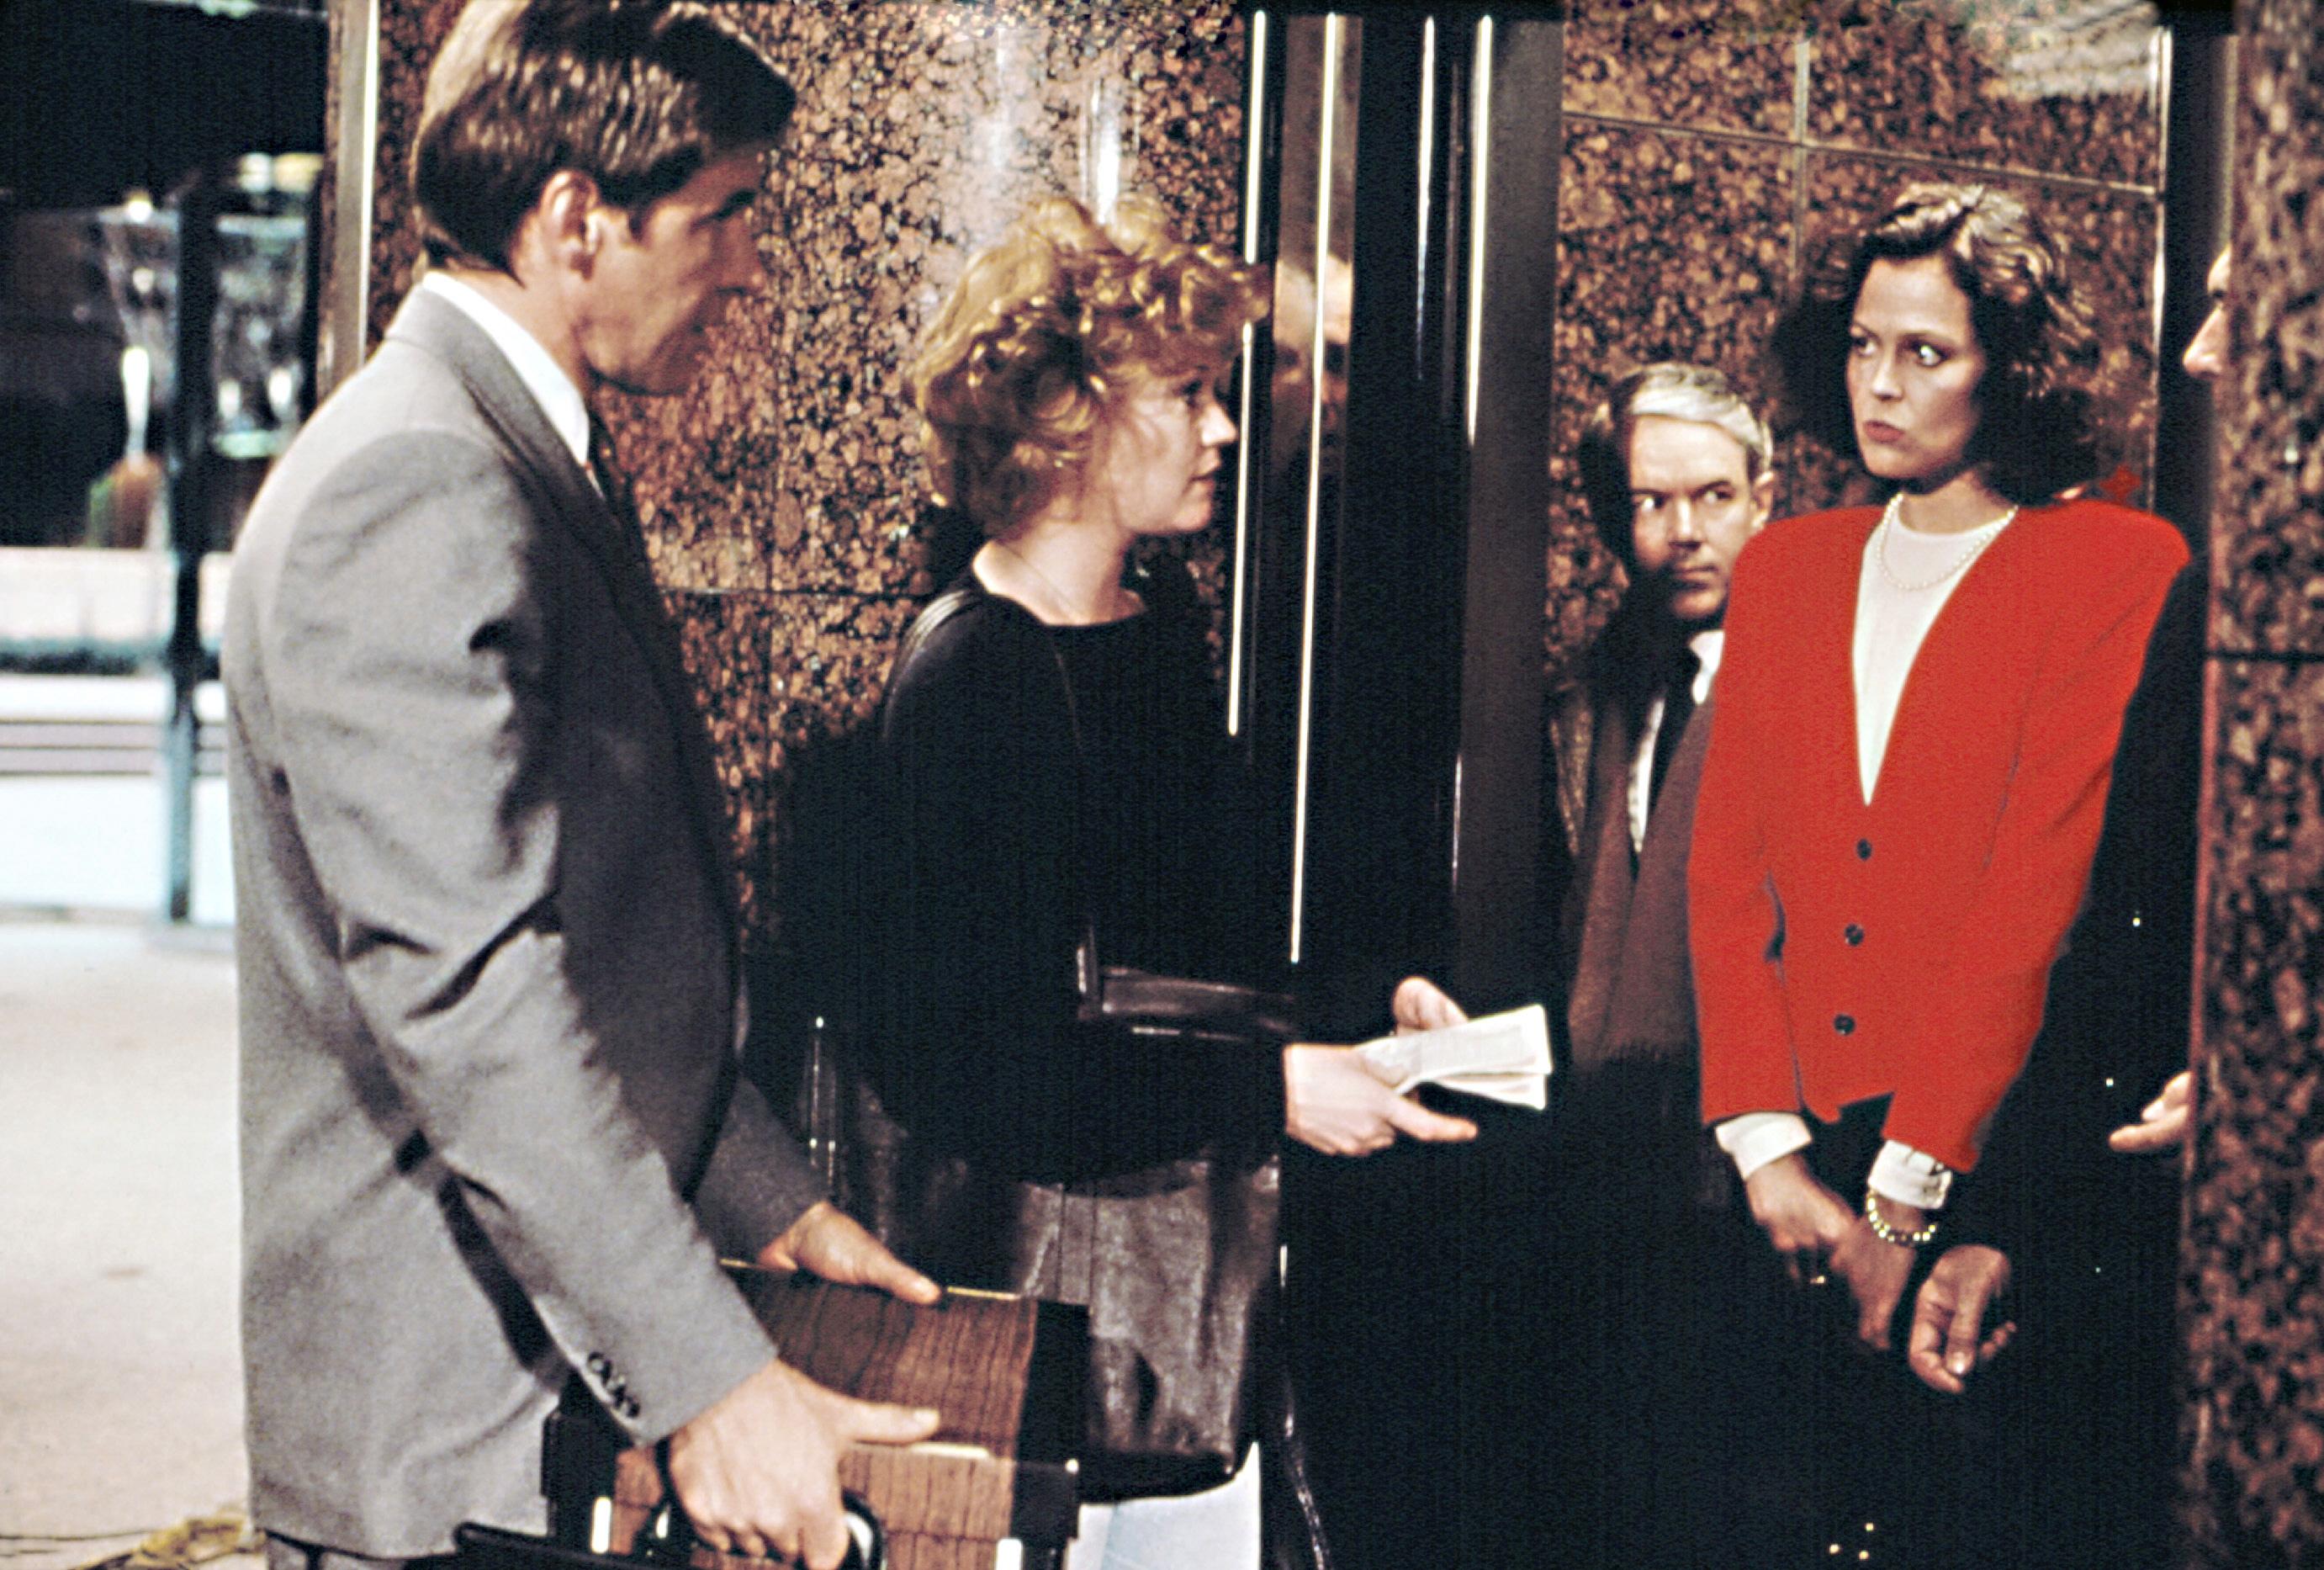 WORKING GIRL, Harrison Ford, Melanie Griffith, Sigourney Weaver, 1988.